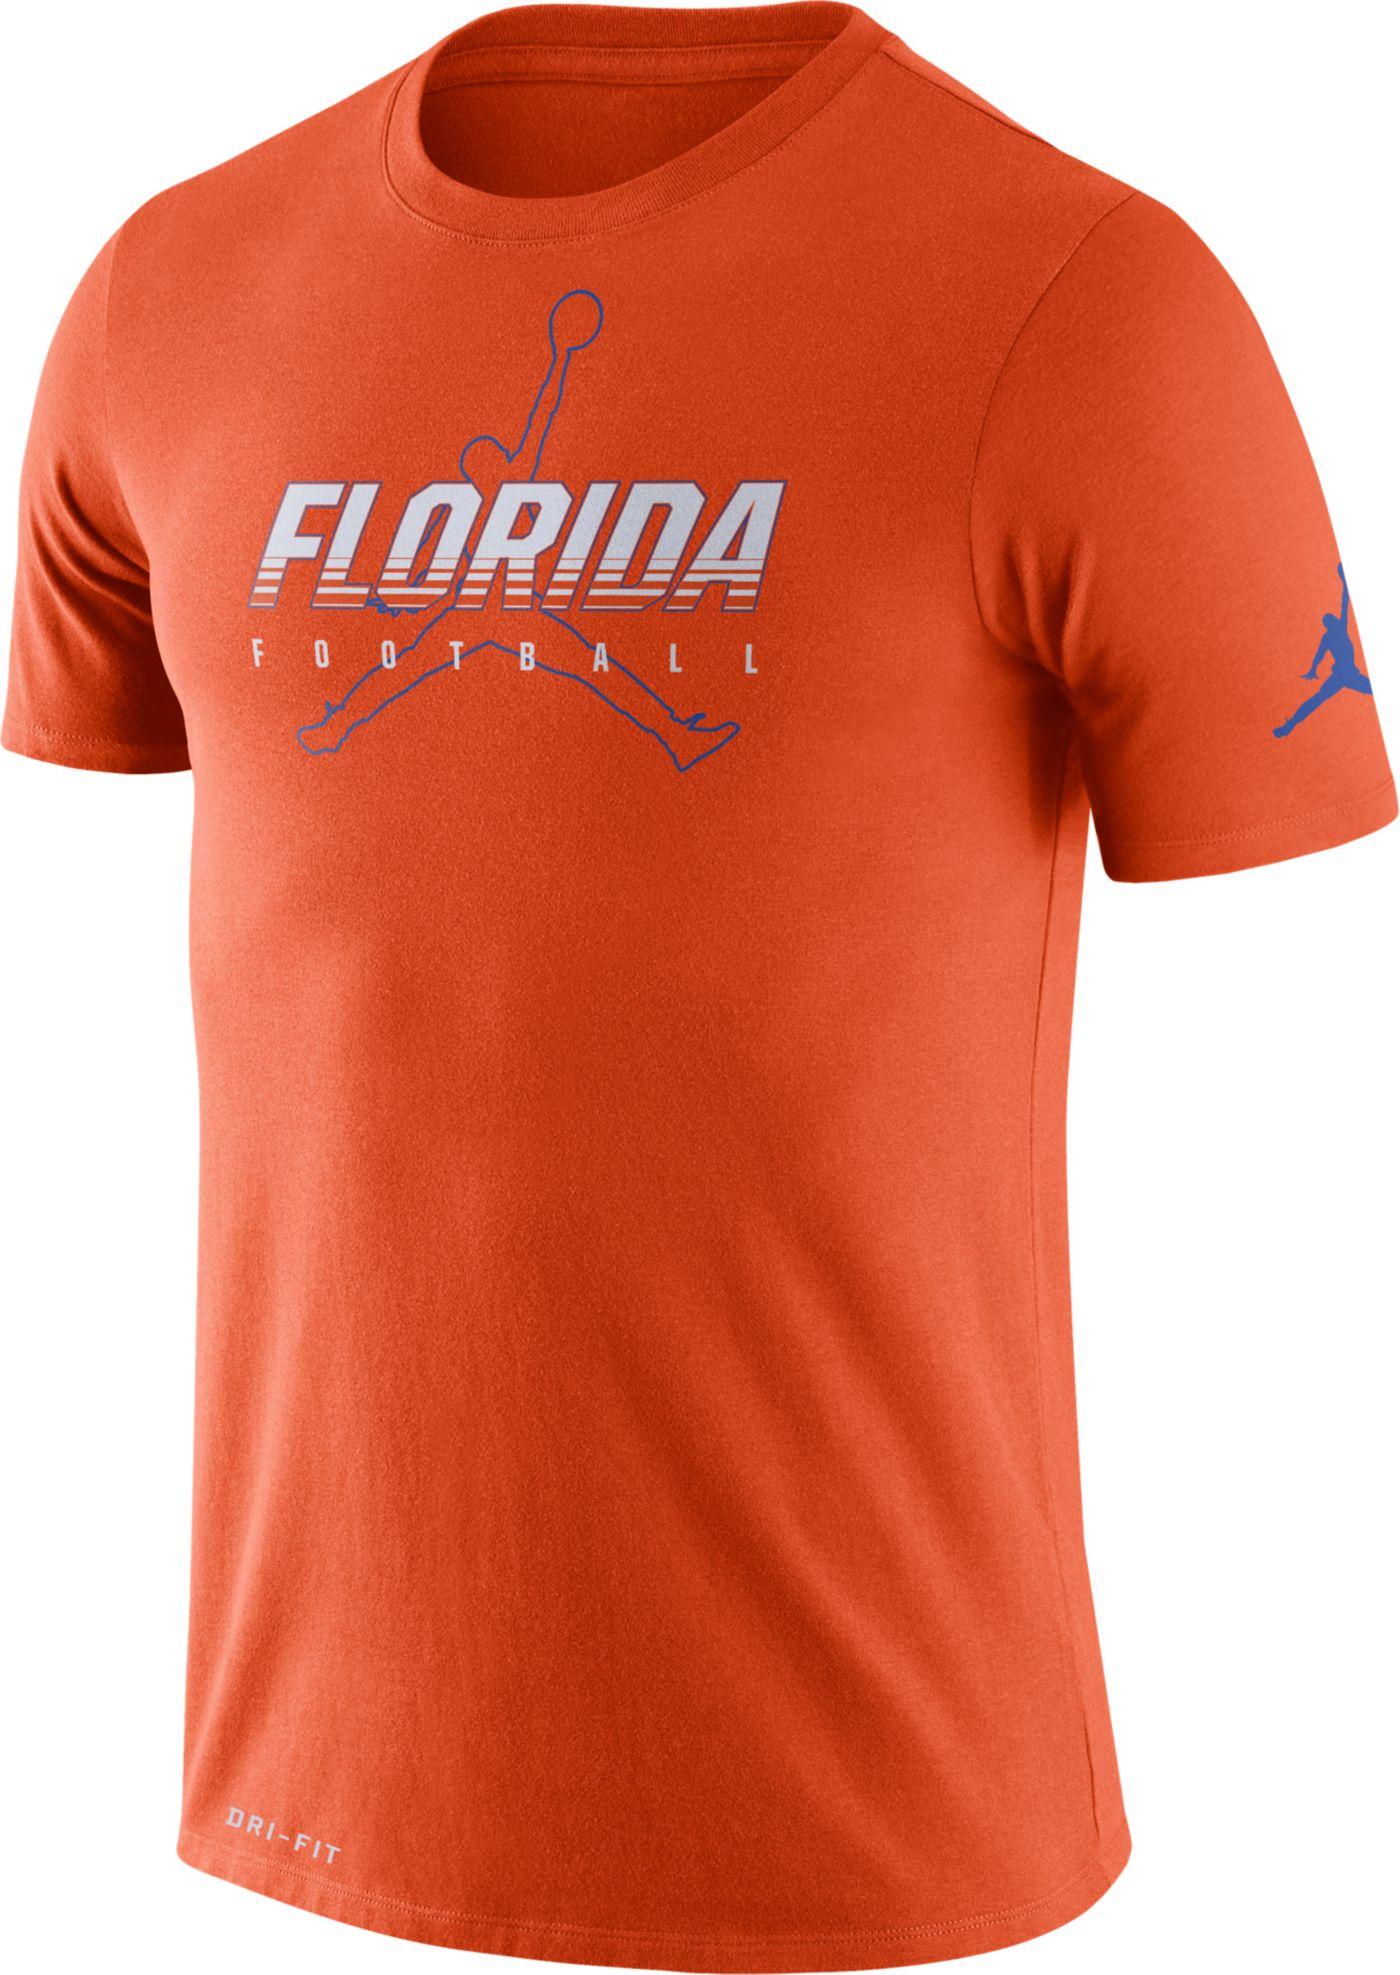 Jordan Men's Florida Gators Orange Football Dri-FIT Cotton Facility T-Shirt